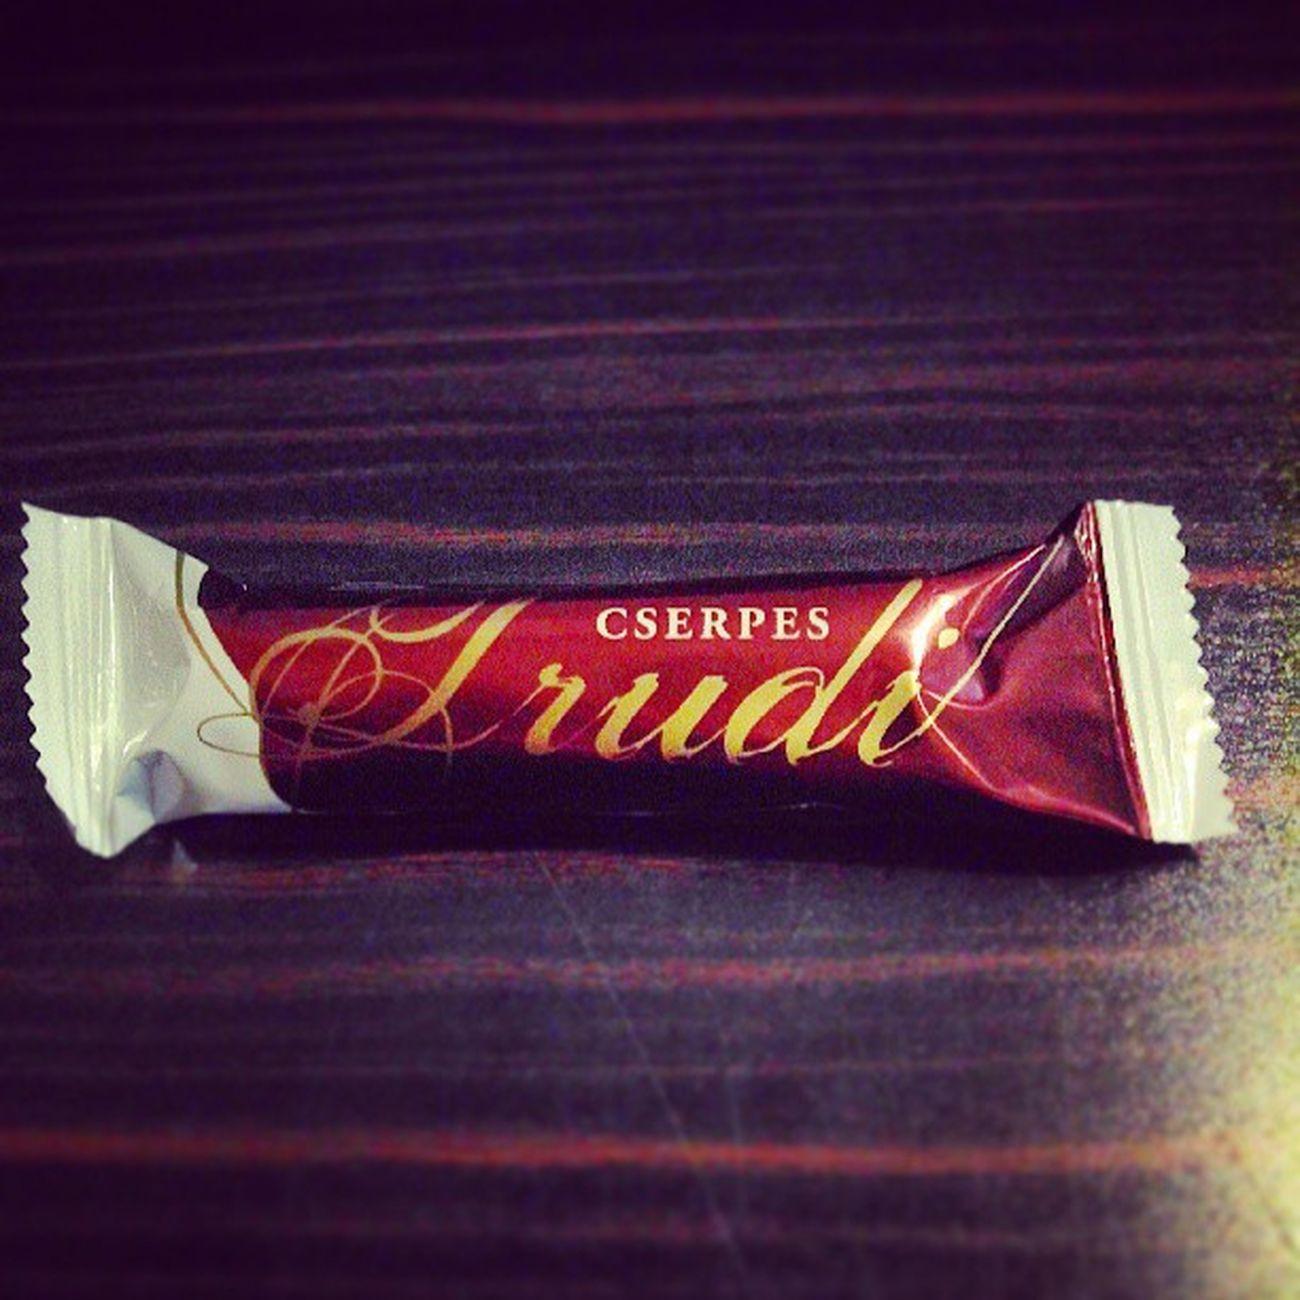 This is supposed to be the best brand. #trudi #túró #cserpes Túró Cserpes Trudi